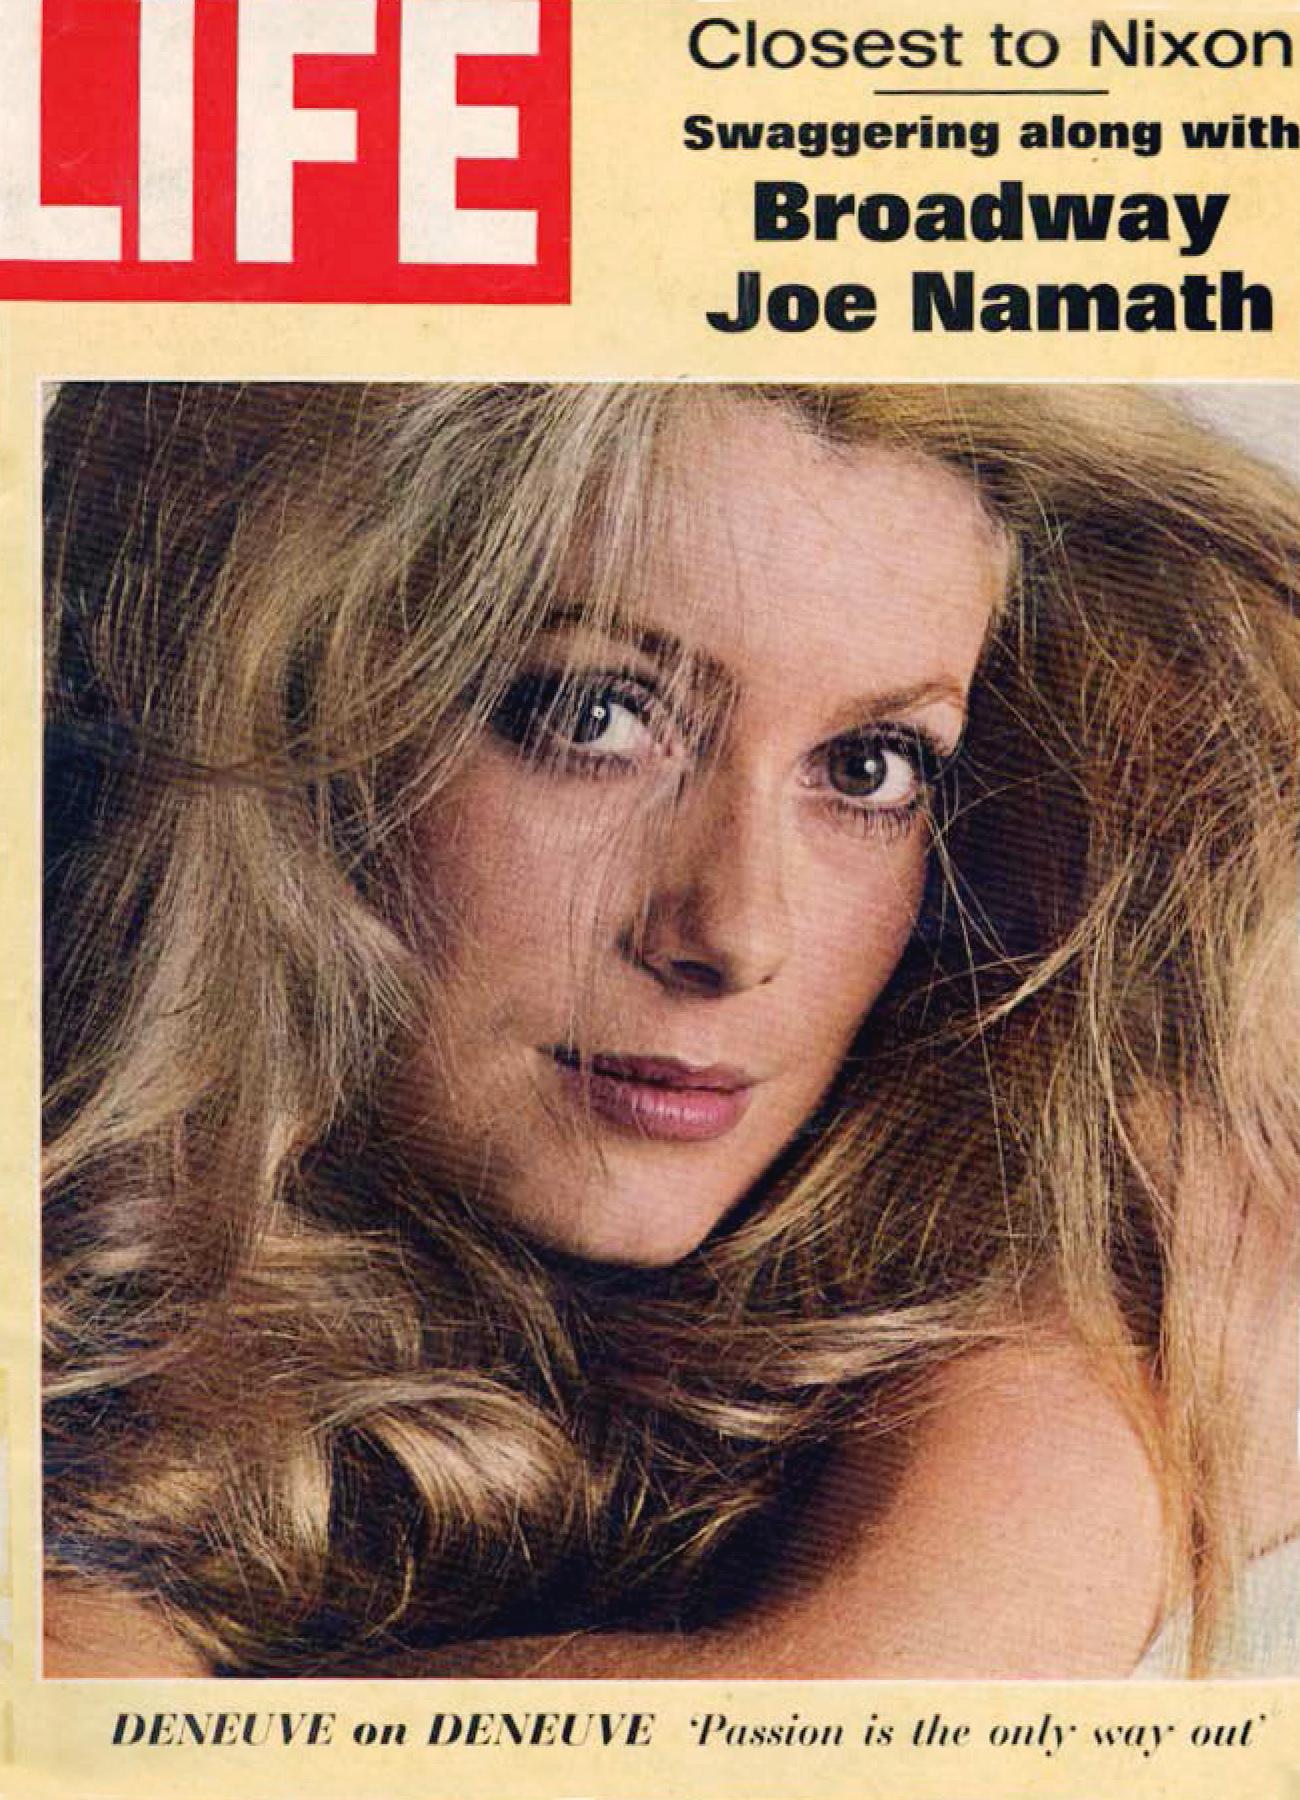 LIFE, January 1969